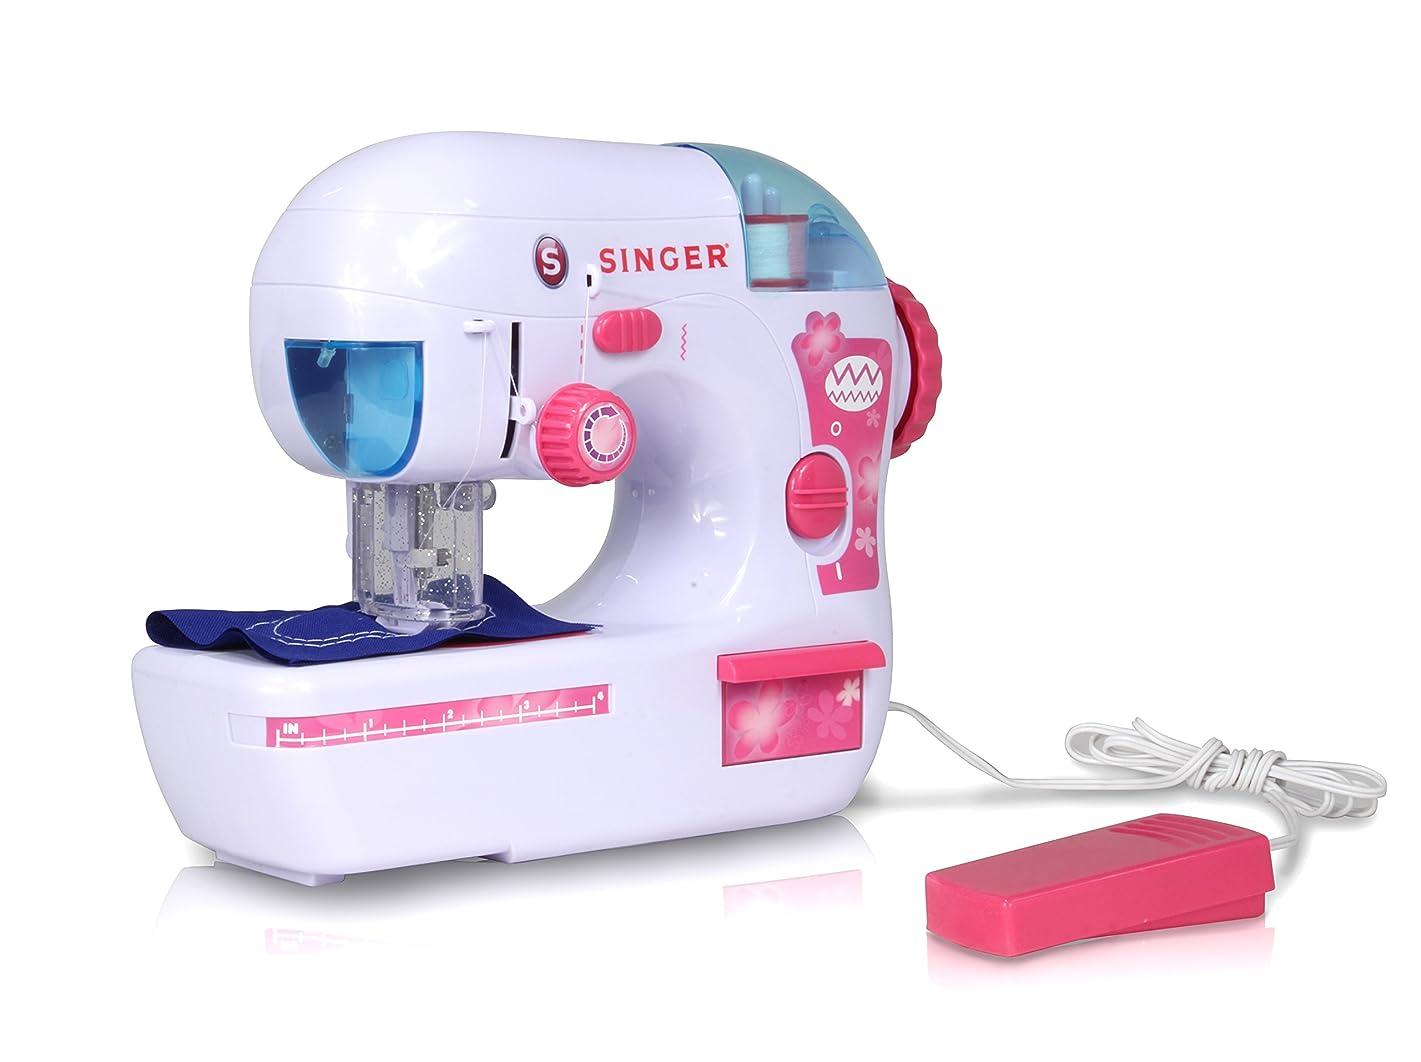 NKOK B/O Singer Zigzag Chain Stitch Sewing Machine